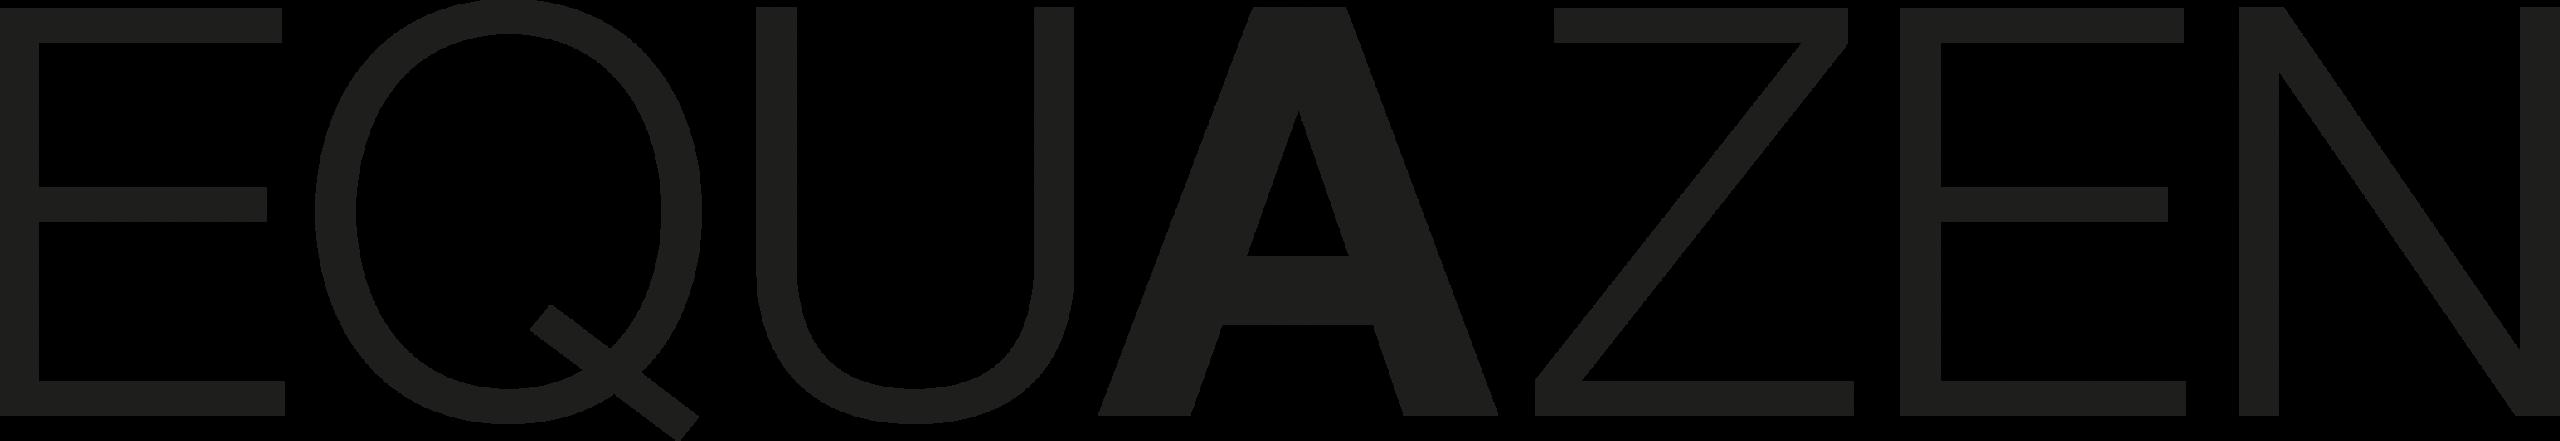 Equazen logo